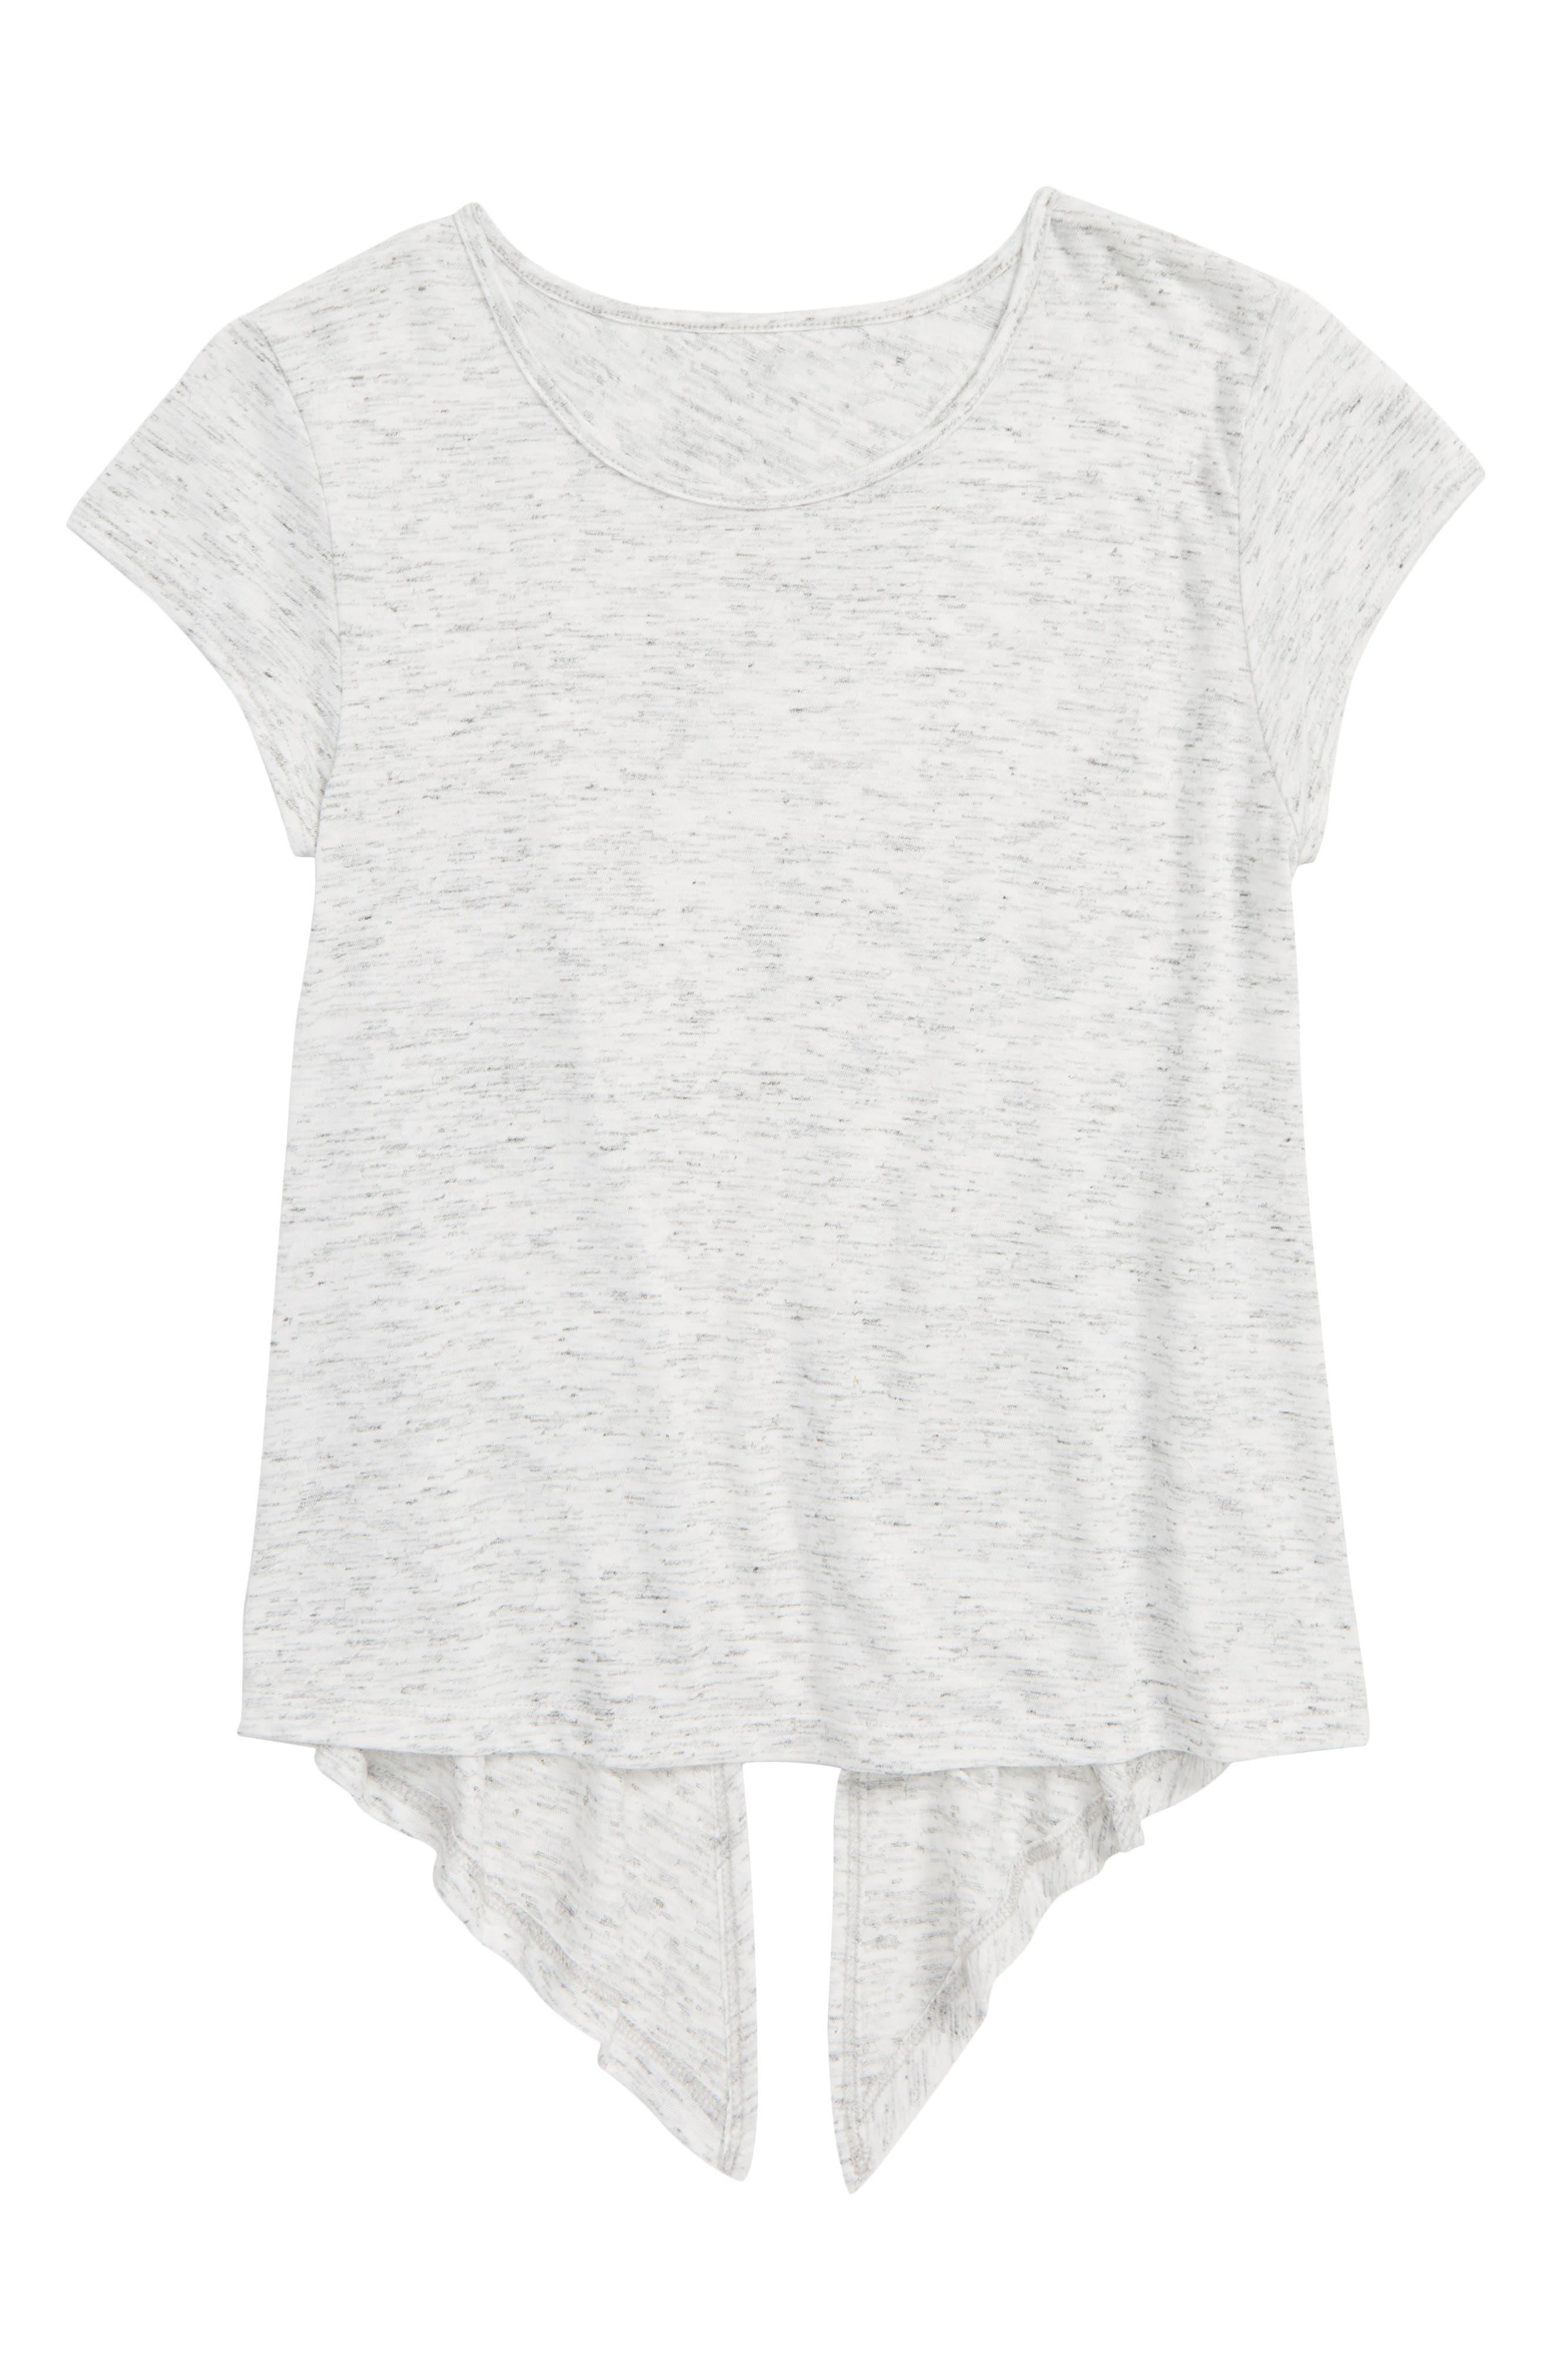 ZELLA GIRL Tango Tie Back Tee, Main, color, WHITE HEATHER